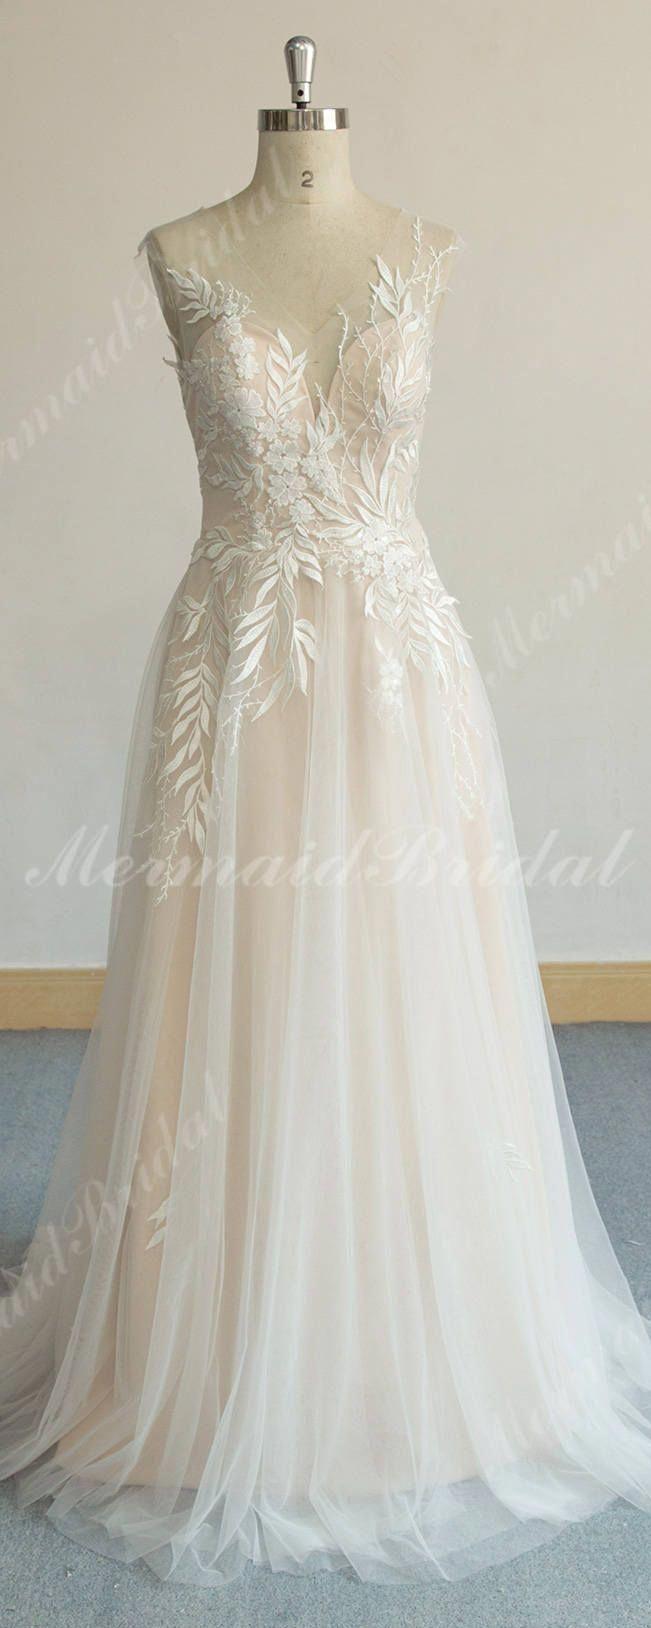 Diy wedding decorations vintage october 2018 Unique Aline Tulle Lace Wedding Dress Elegant Vintage Boho Wedding